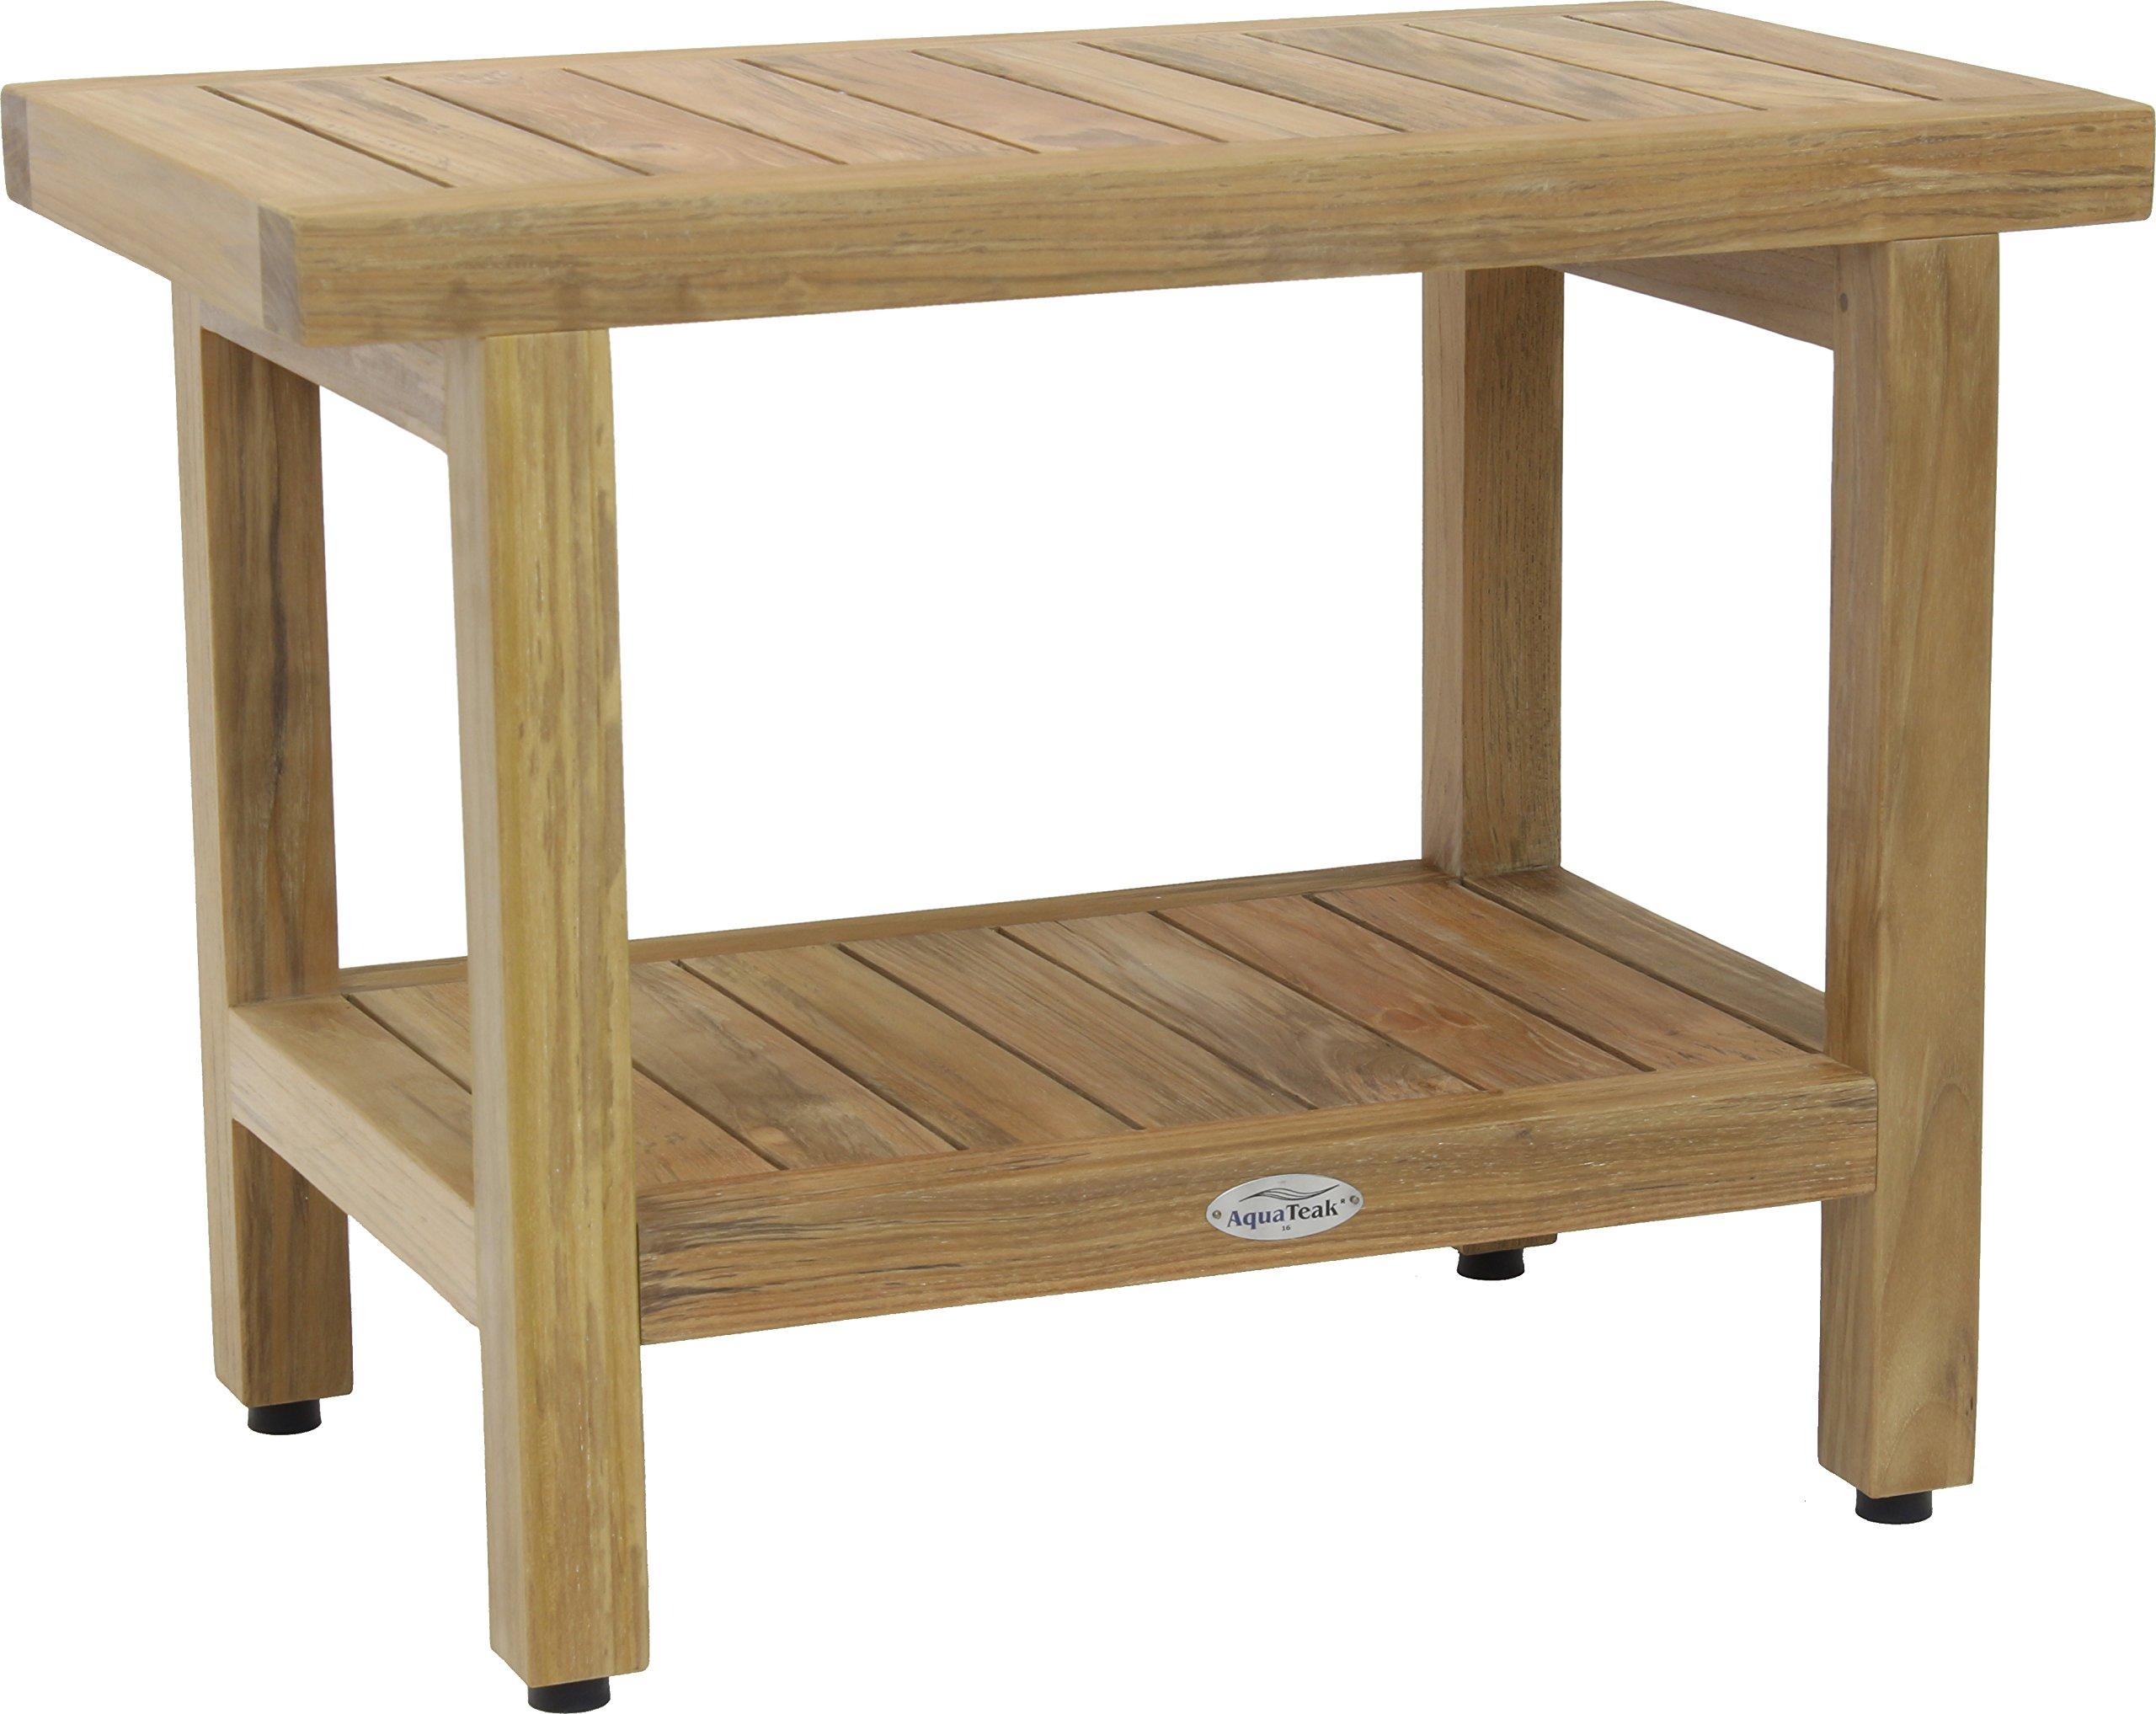 24'' Spa Natural Teak Shower Bench with Shelf